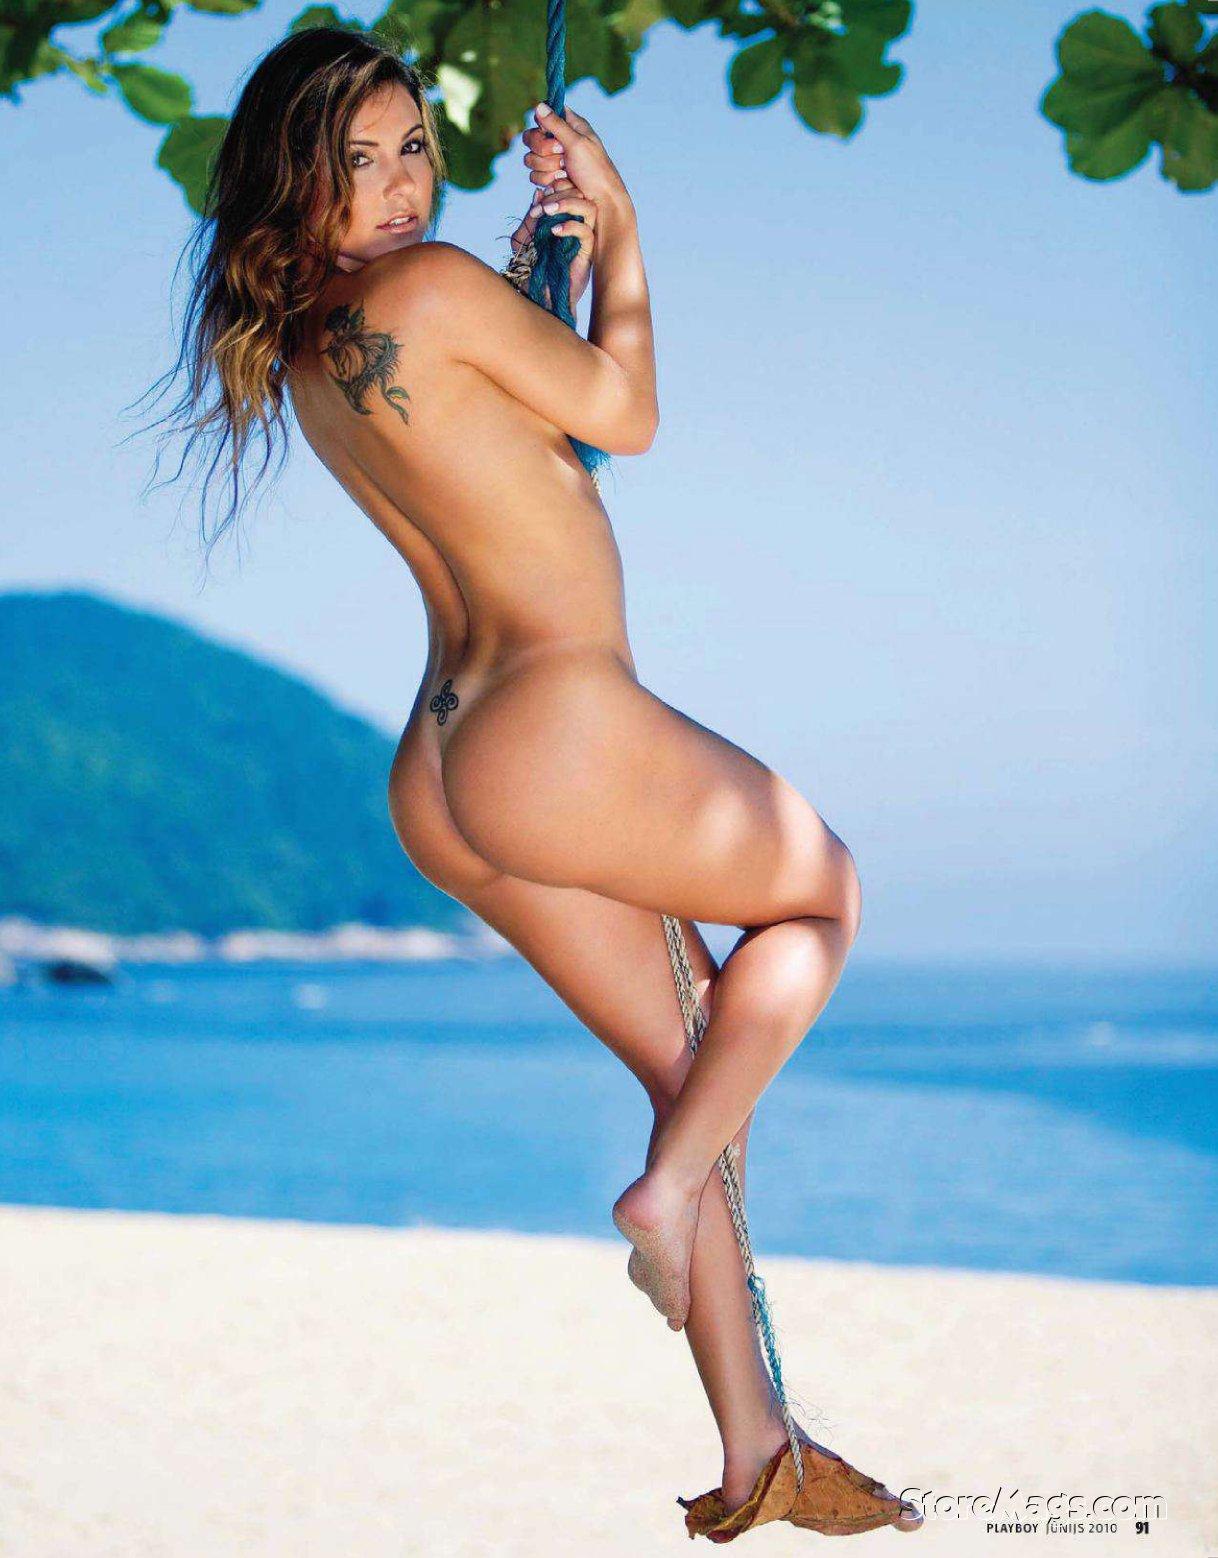 384517170_Playboy_06_2011_Latvia_Scanof.net_099_123_150lo.jpg